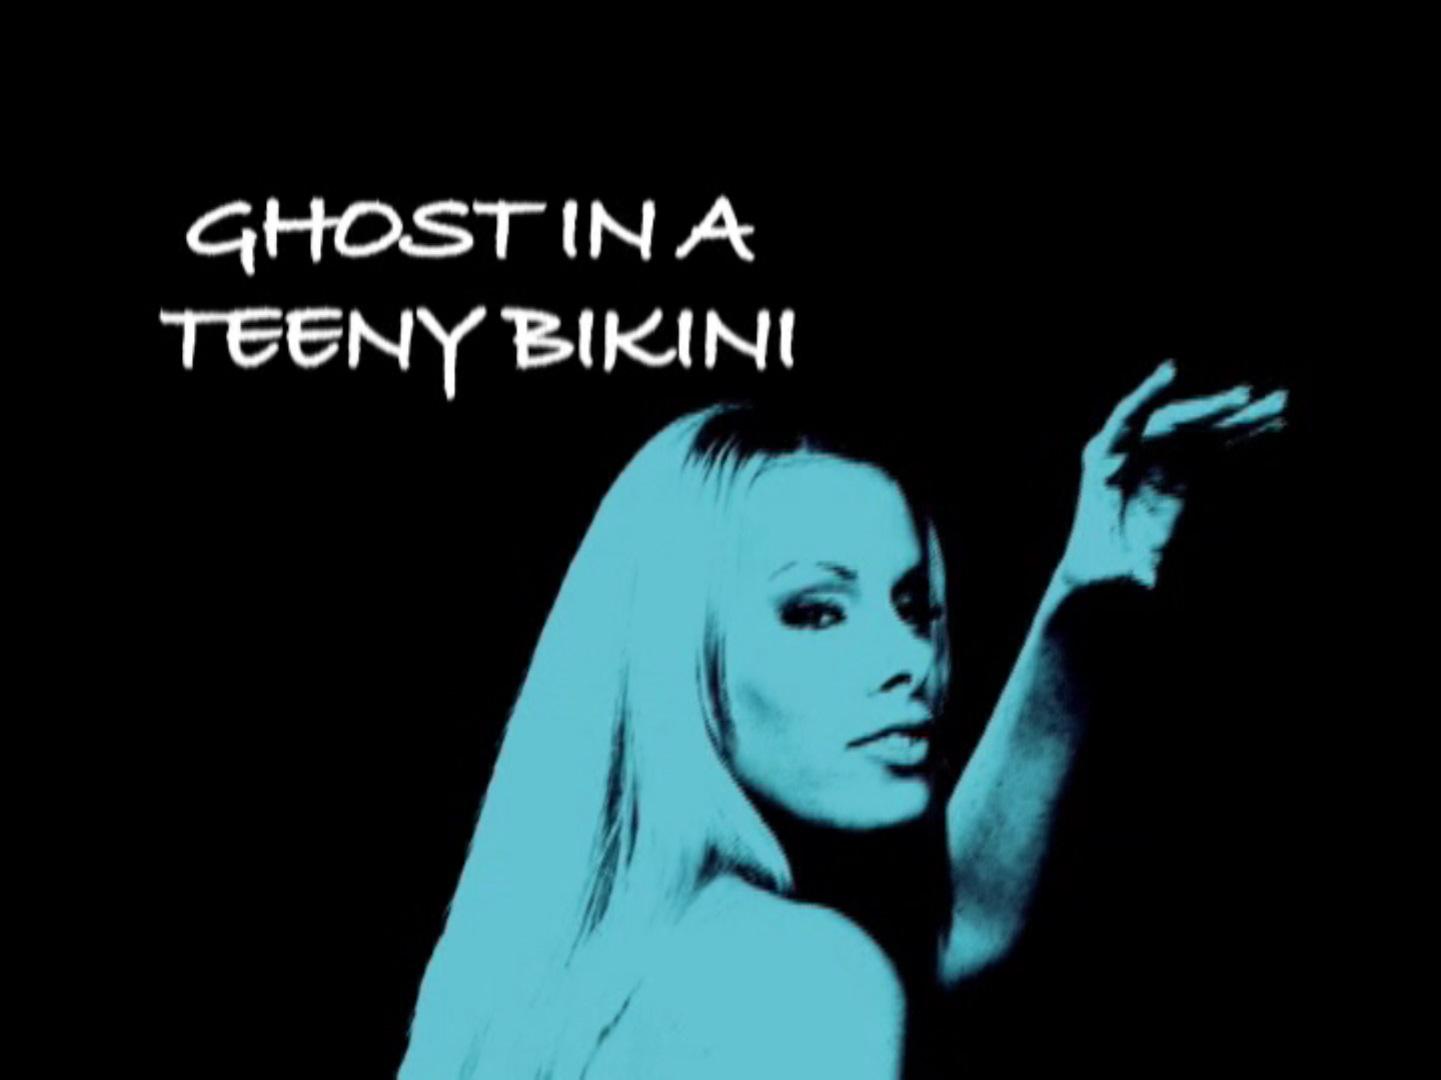 ghost-in-a-teeny-bikini-hot-sex-scenes